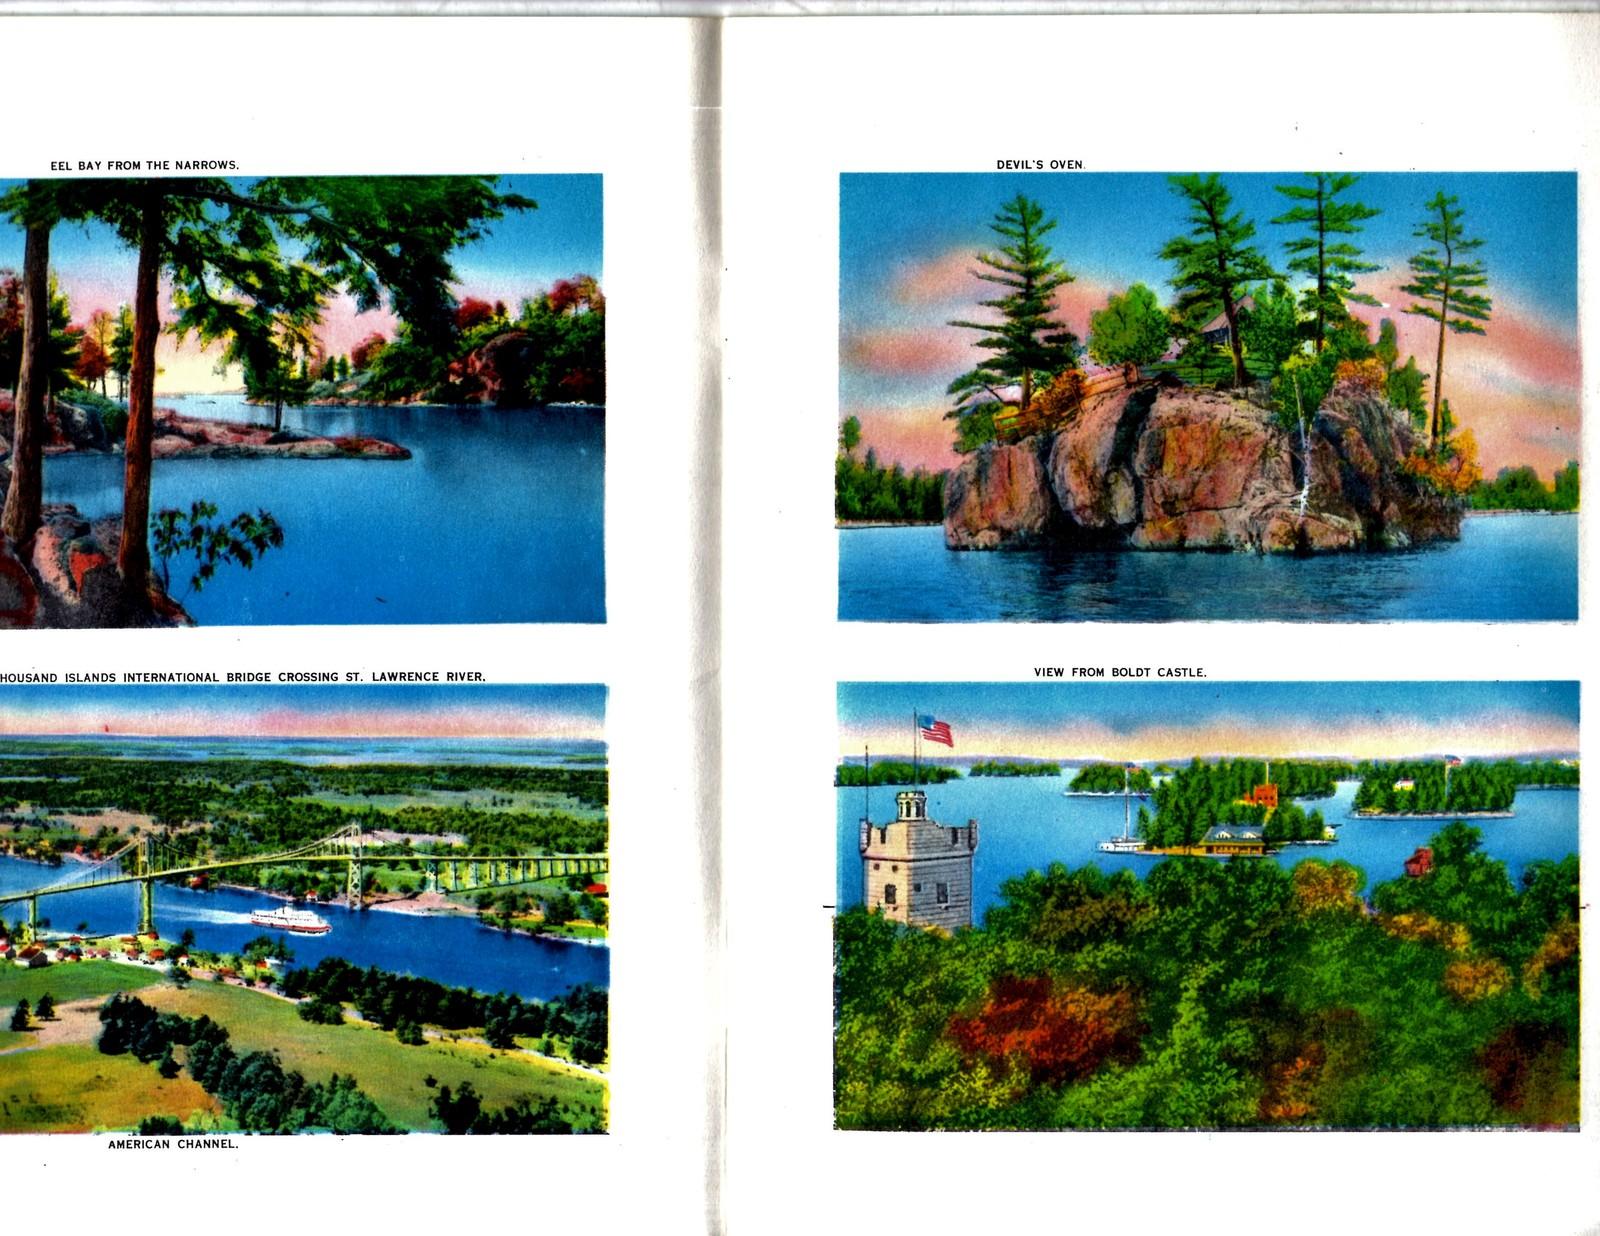 Thousand Islands Venice Of America Book & Souvenir Photo Booklet image 4